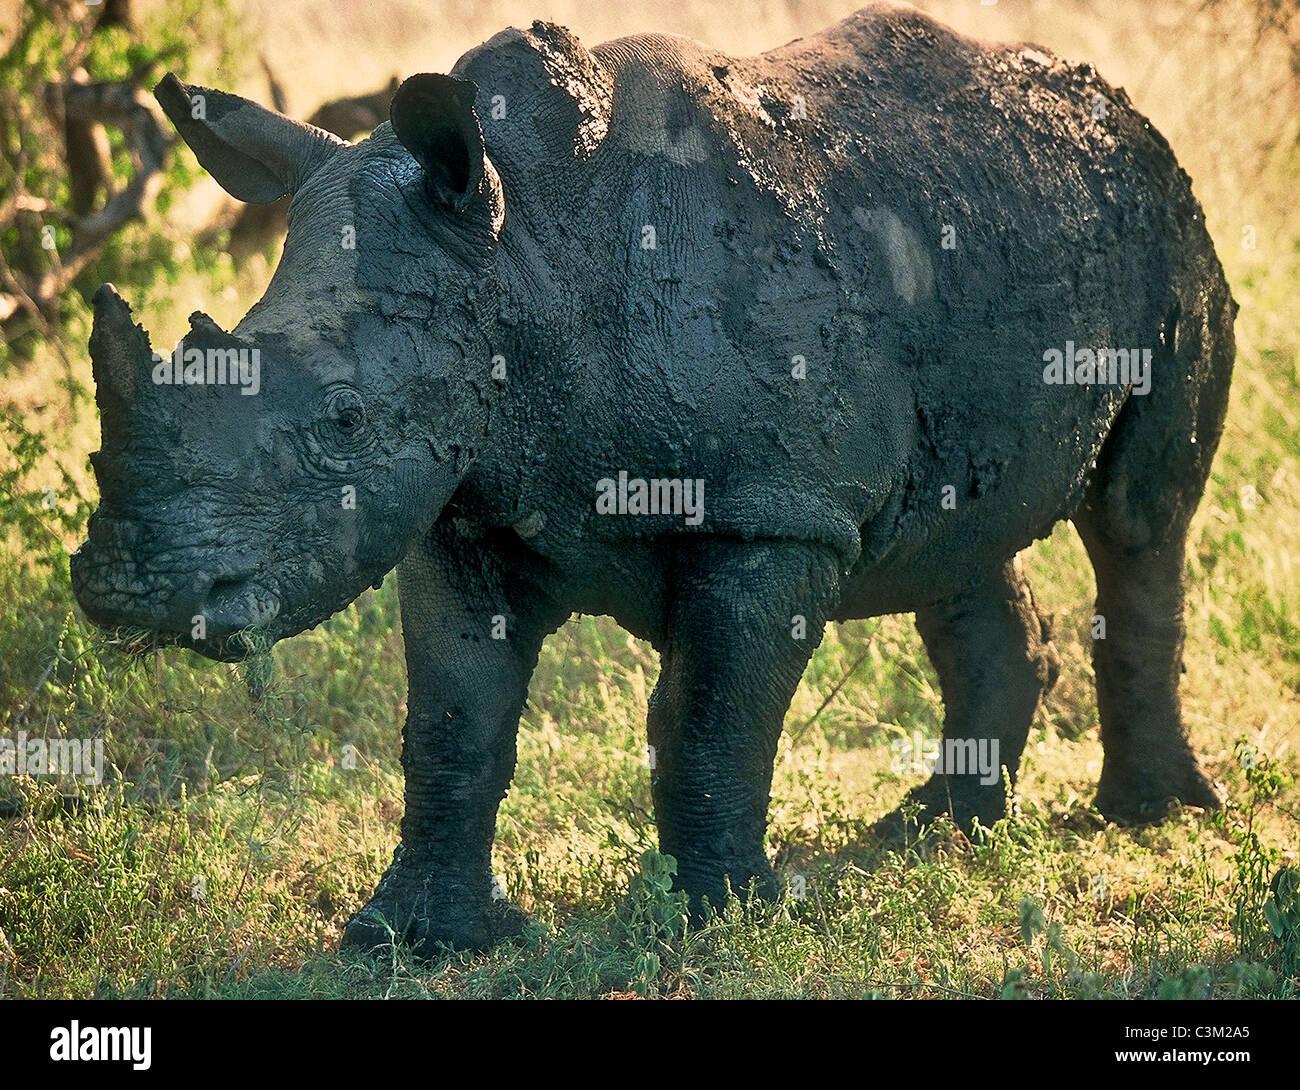 White rhino Ceratotherium simum covered in mud Kruger South Africa - Stock Image